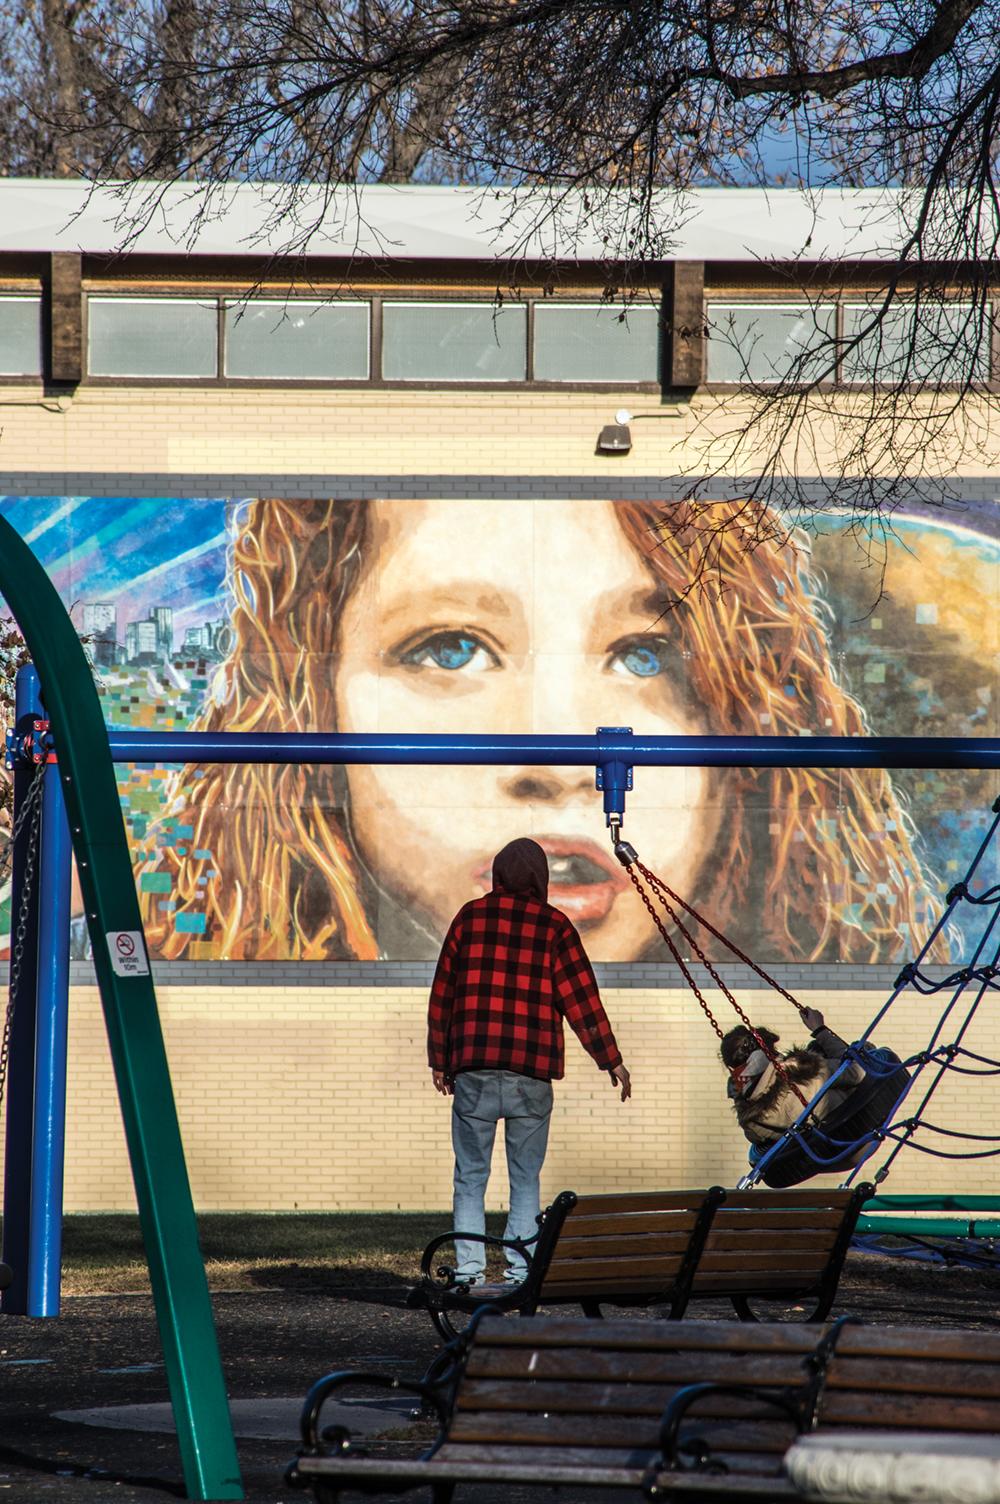 ADj Swing and Mural_IMG3888_web.jpg